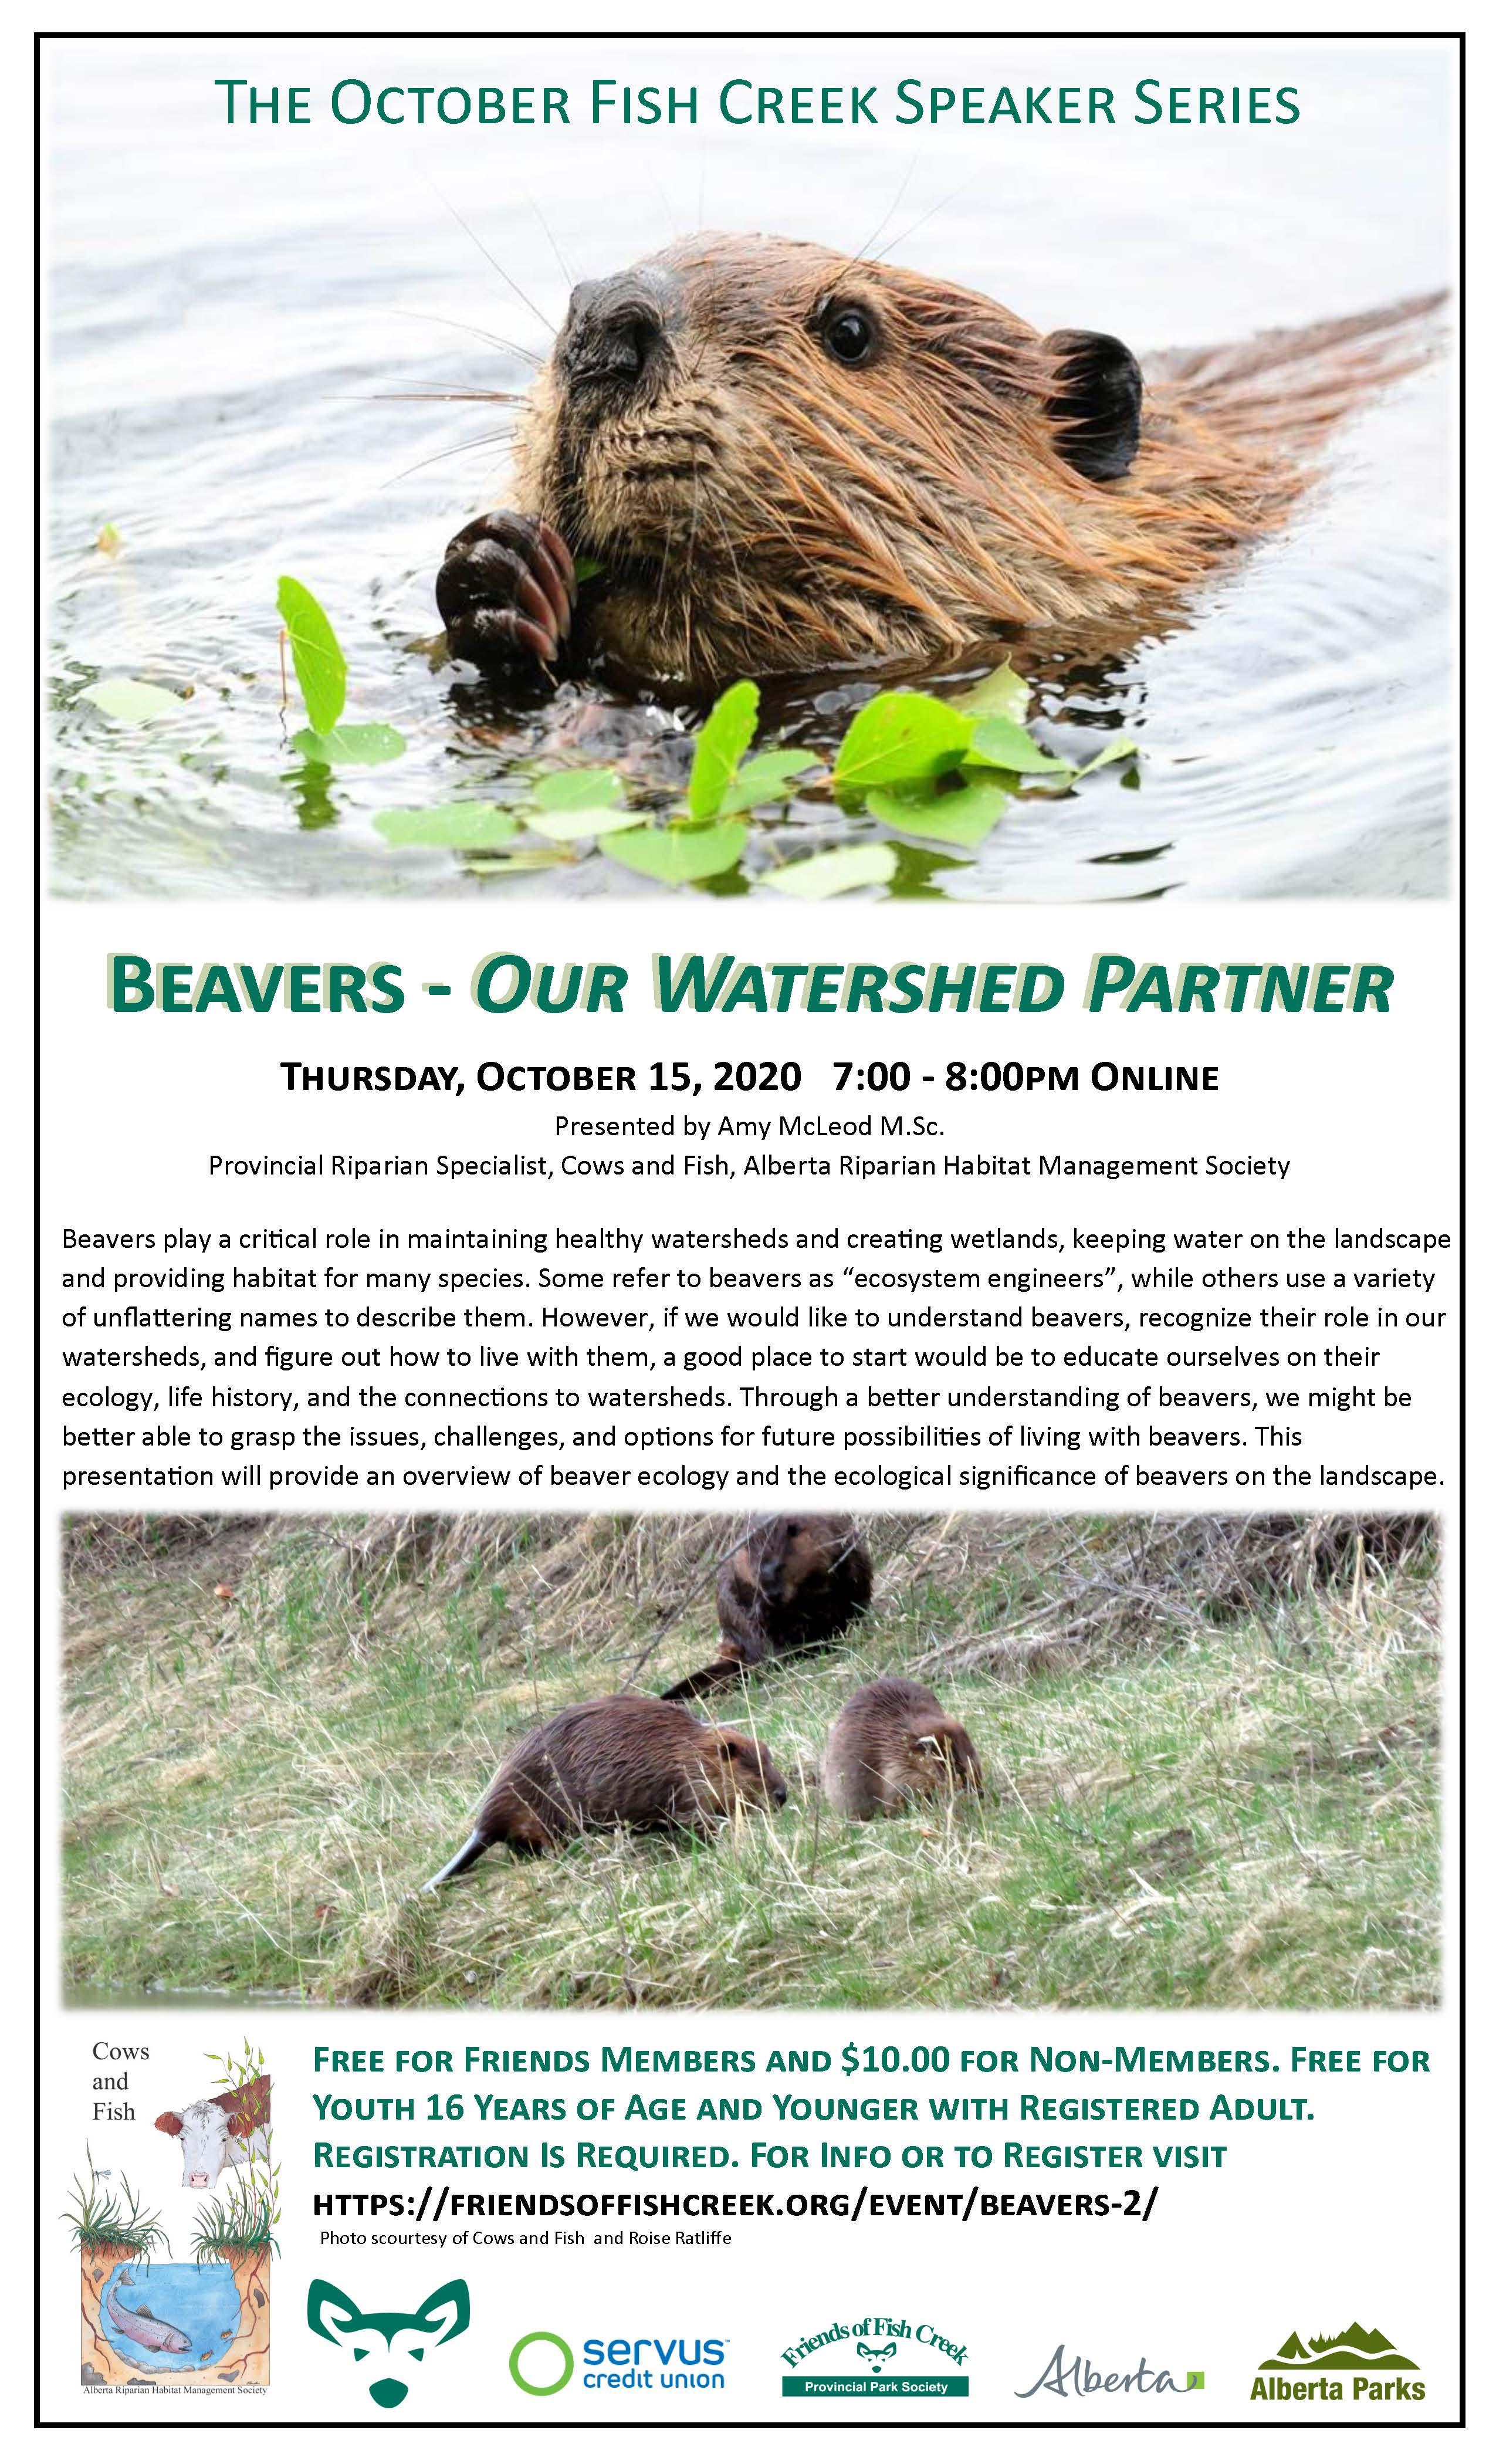 Beaver - Our Watershed Partner Webinar